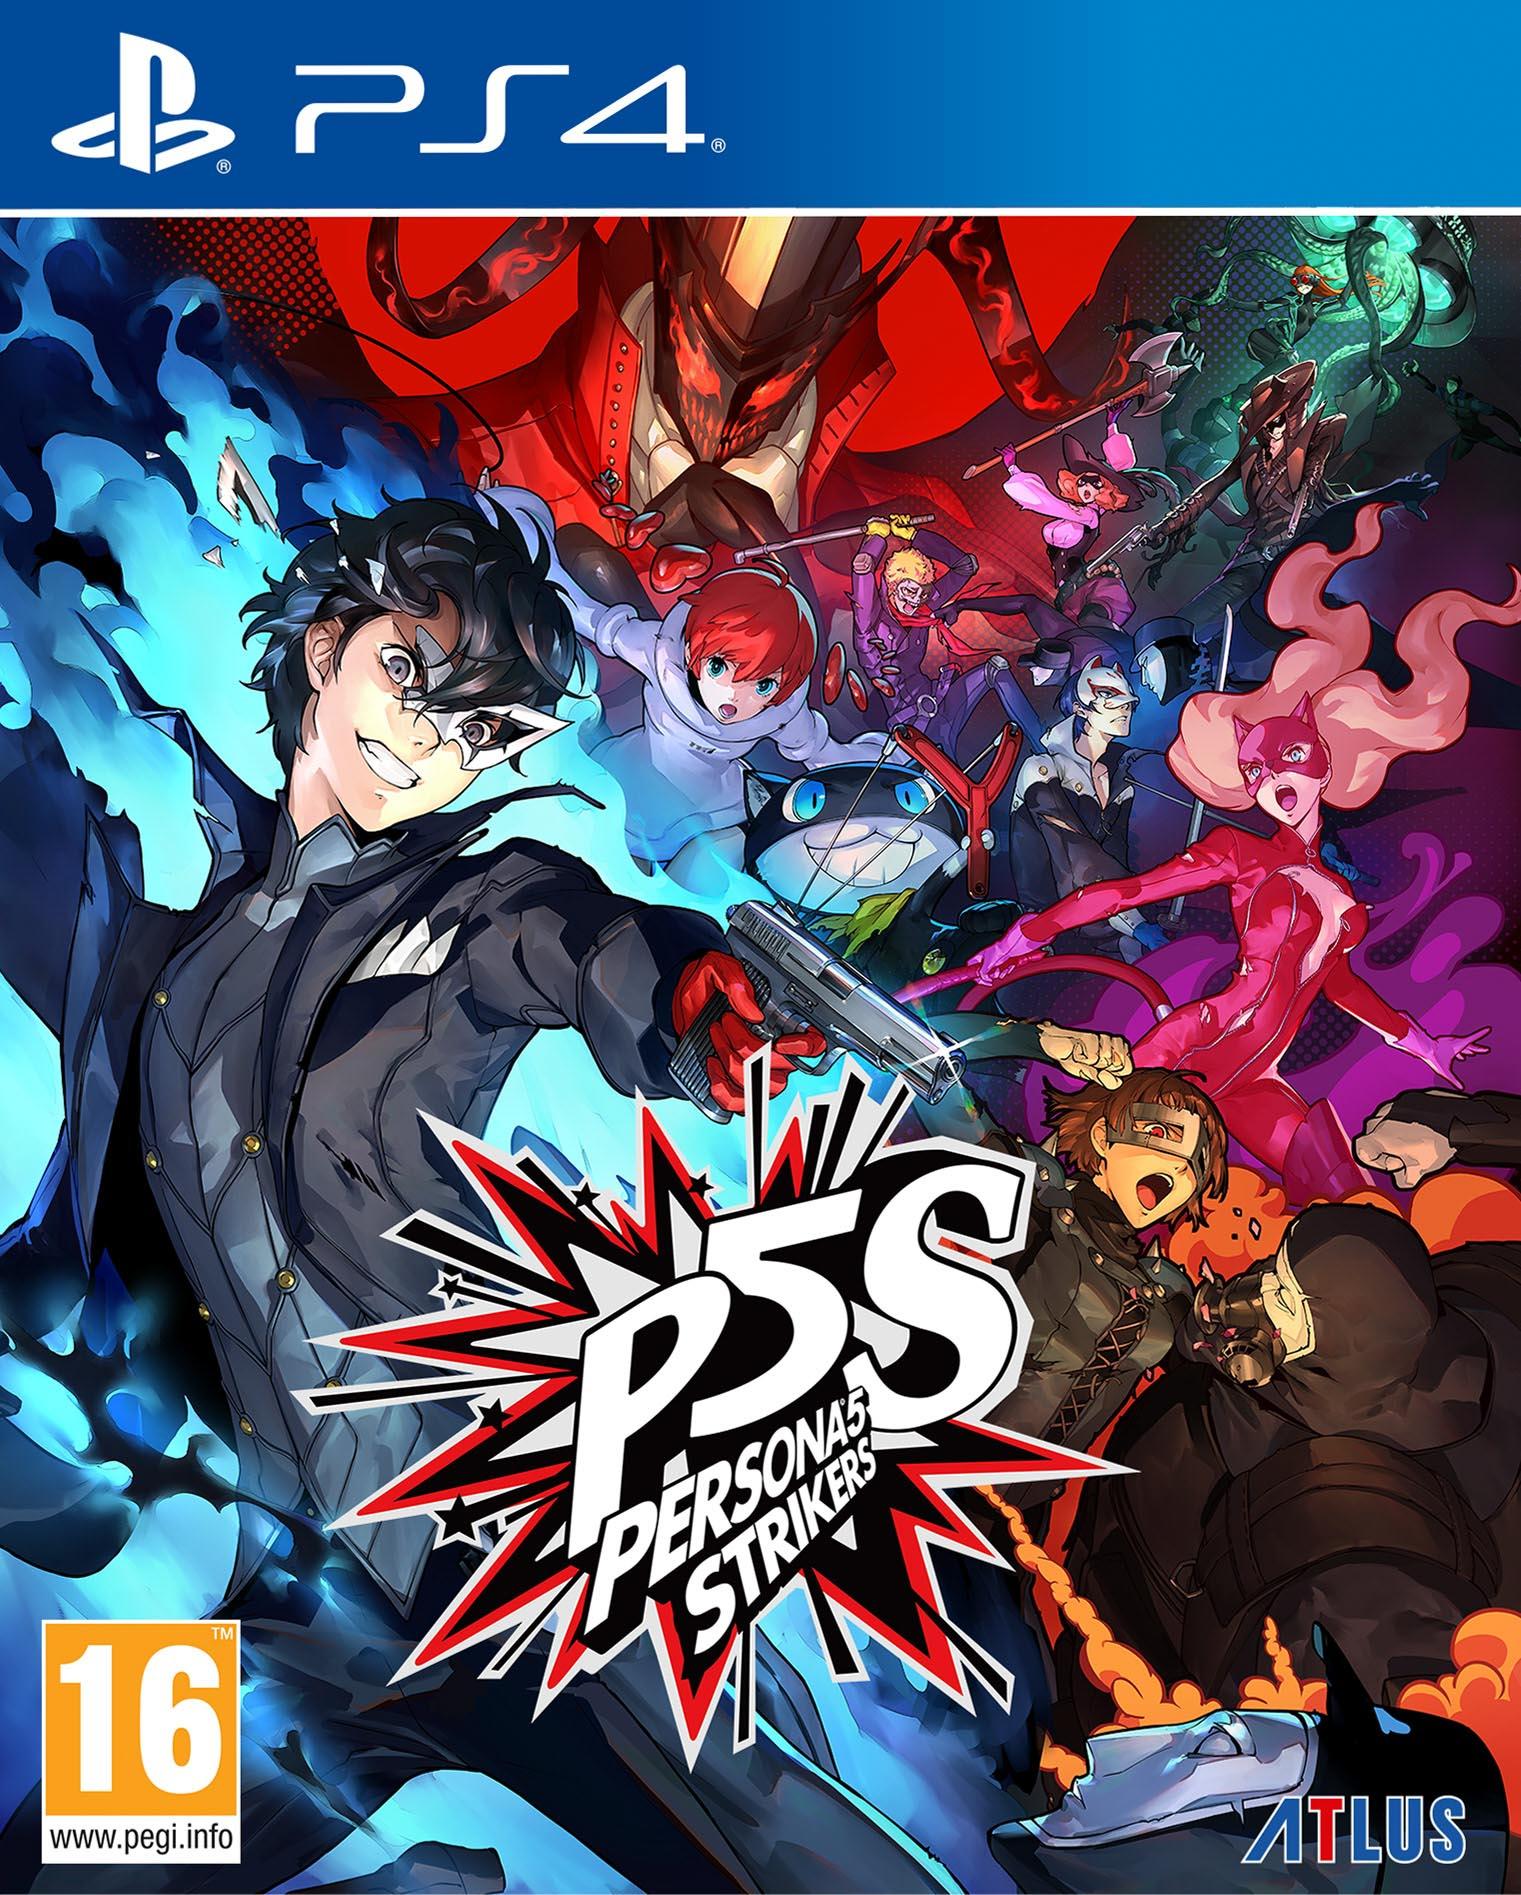 Persona 5 Strikers Limited Ed. PS4 - SEGA 1.12.01.21.011